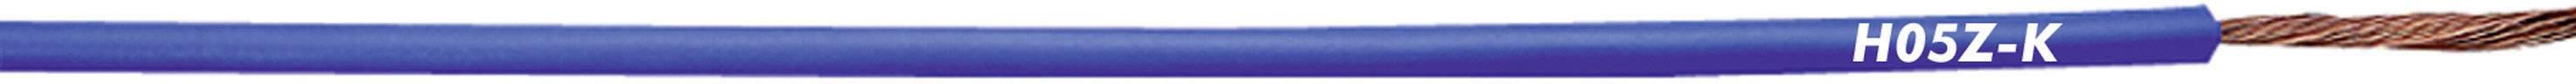 Kabel LappKabel H05Z-K (4725073), 1x 1 mm², Ø 2,50 mm, 1 m, fialová